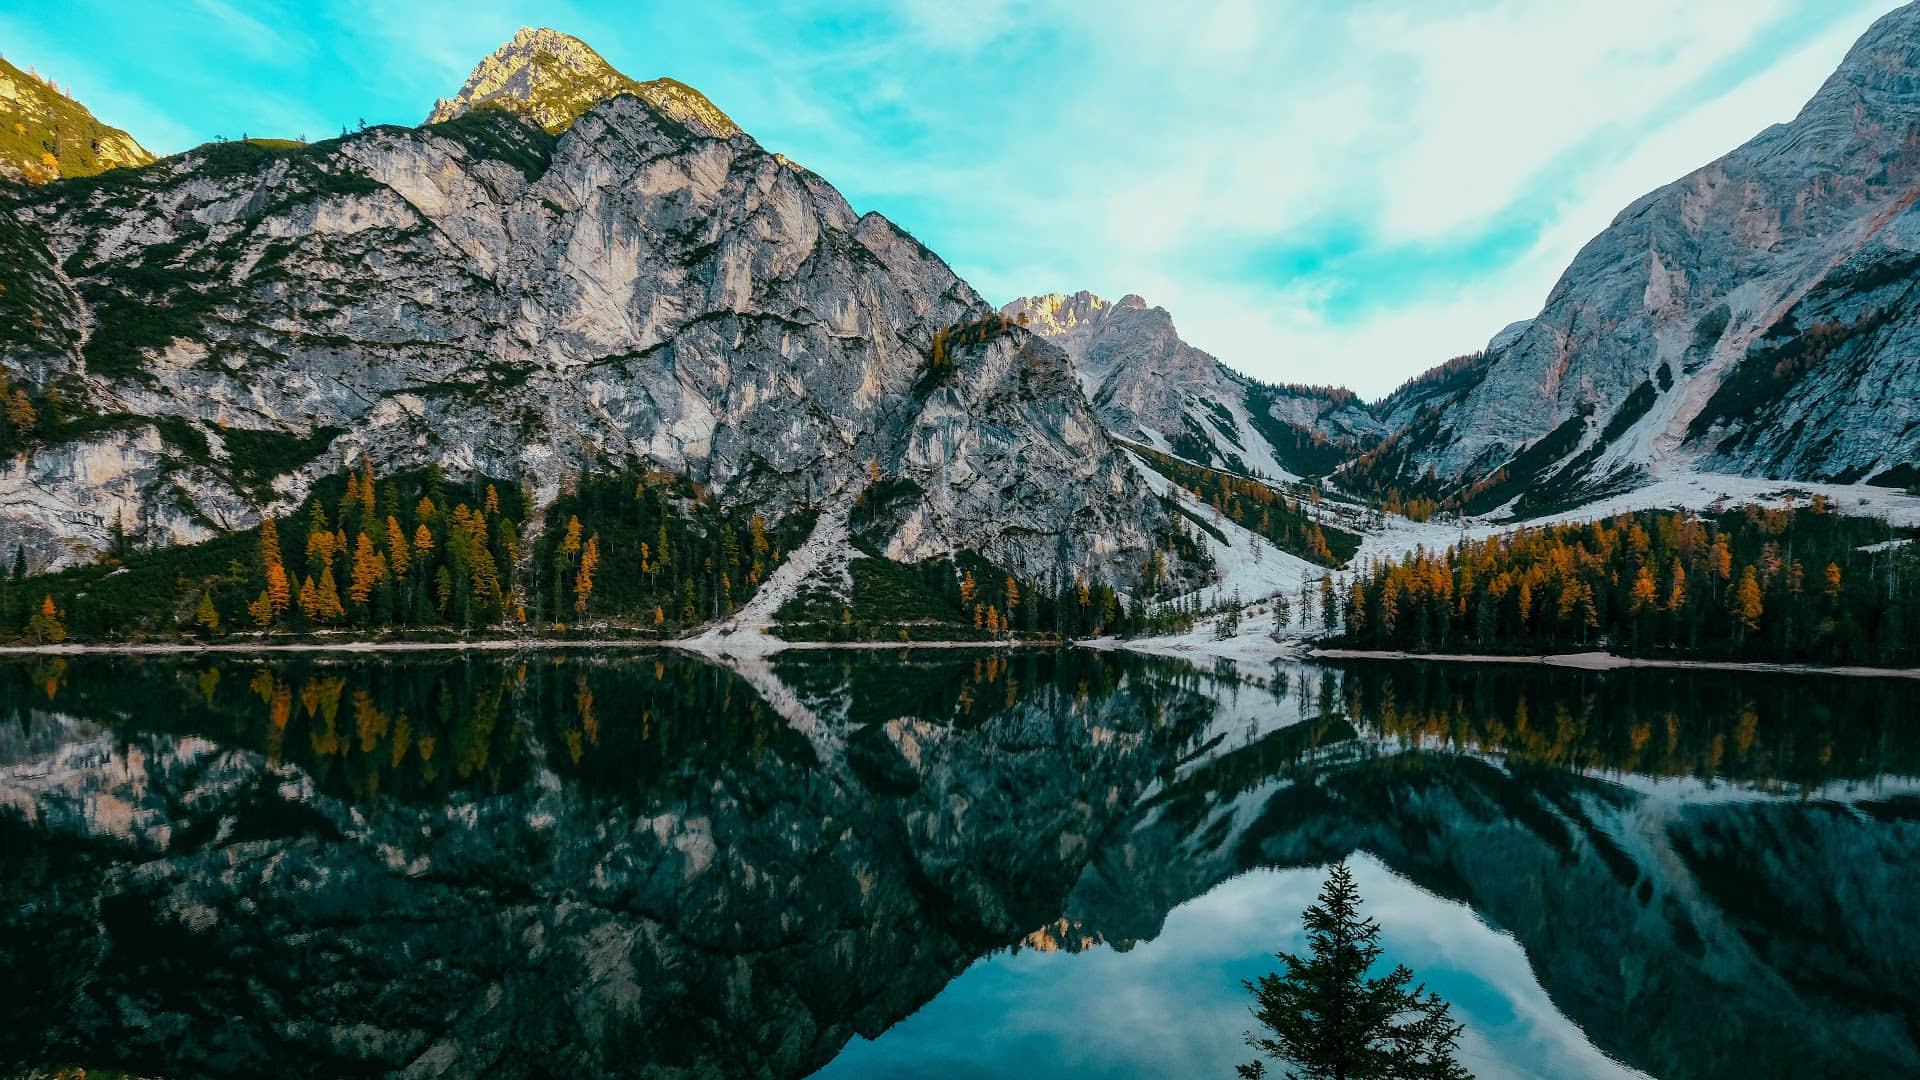 mountain-nature-lake-landscape-scenery-8K